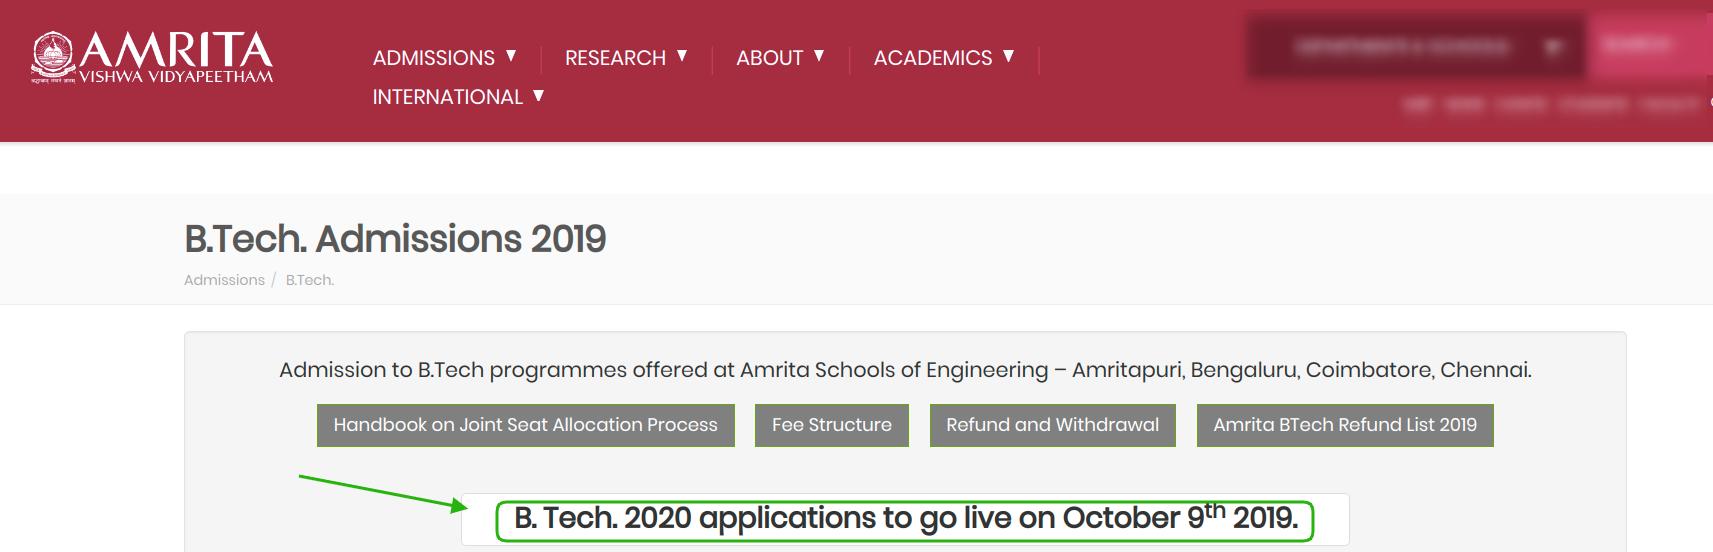 Amrita AEEE 2020 Application release date